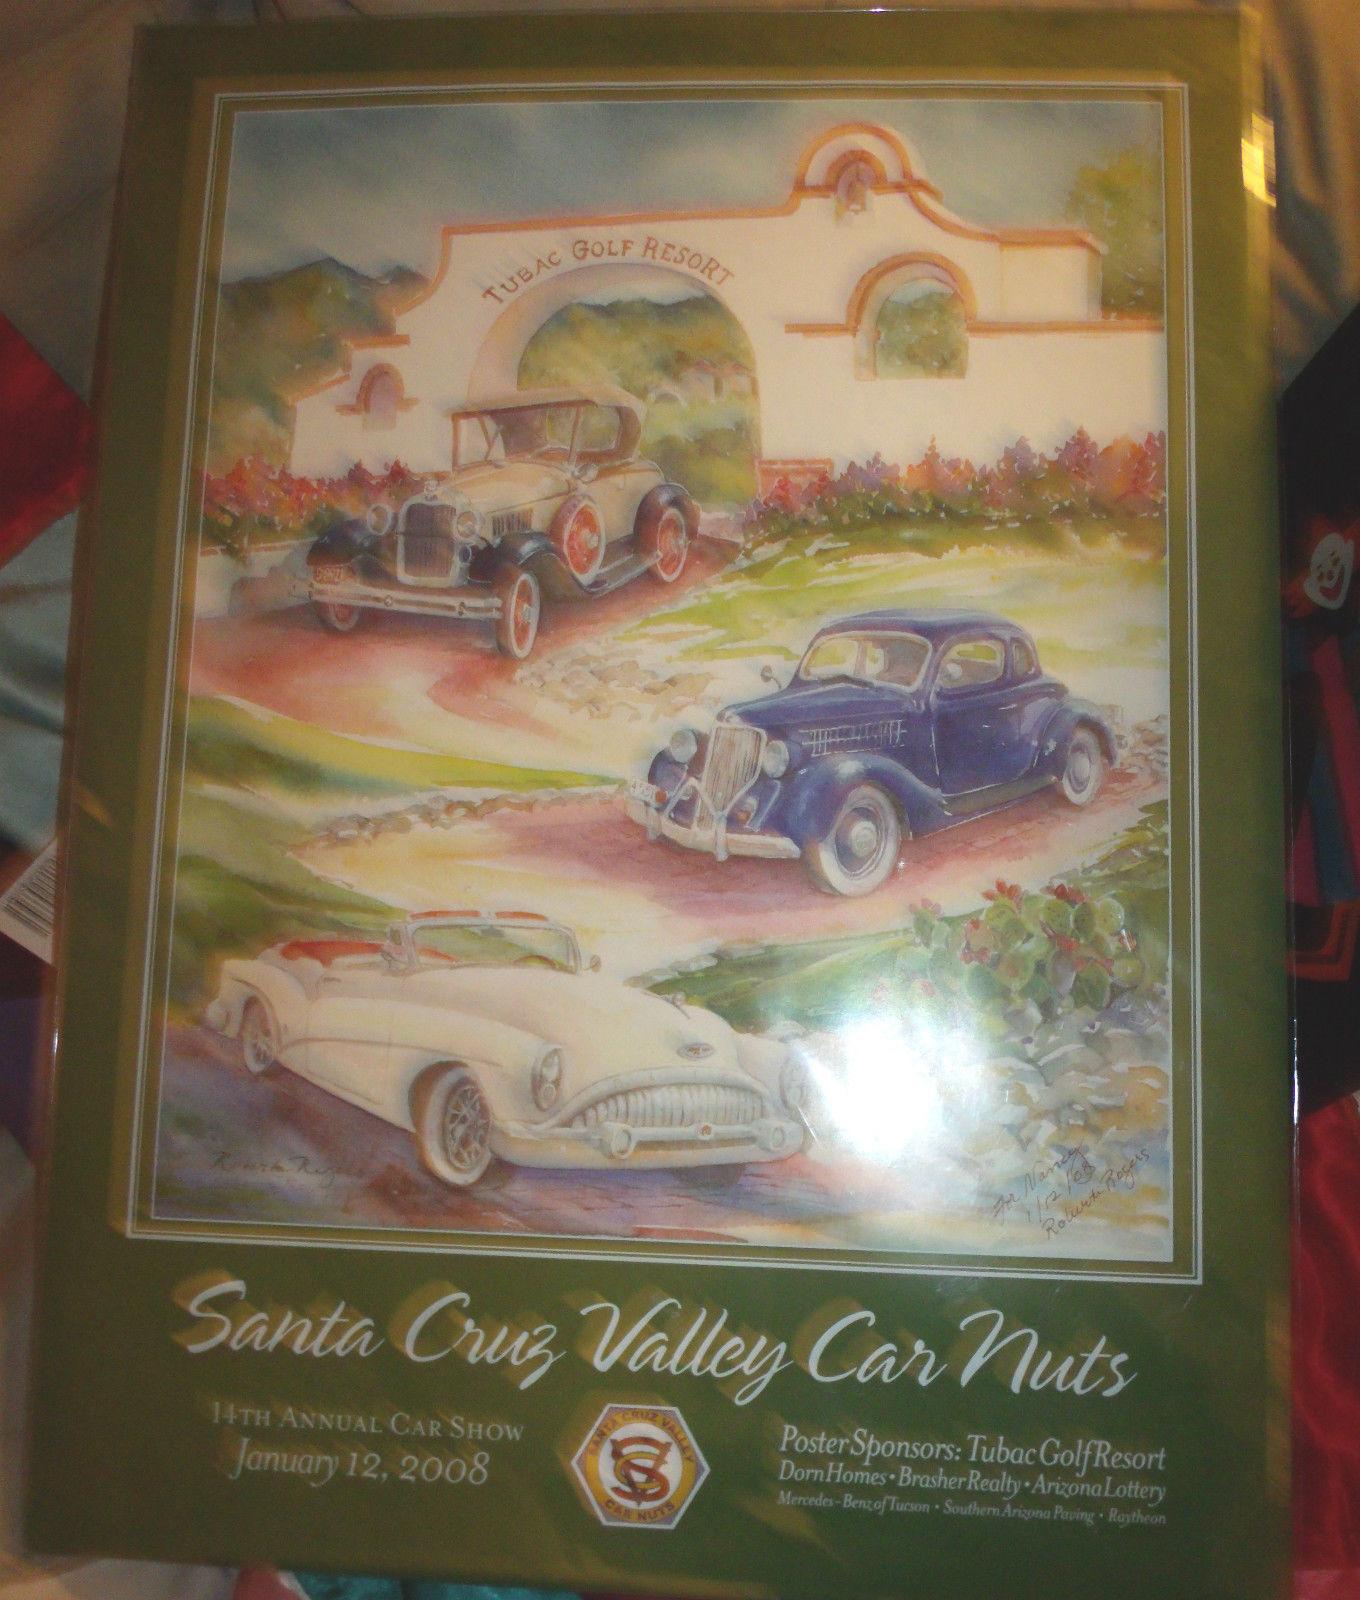 SANTA CRUZ VALLEY CAR NUTS 14TH ANNUAL LITHOGRAPH SIGNED #'D ROBERTA ROGERS